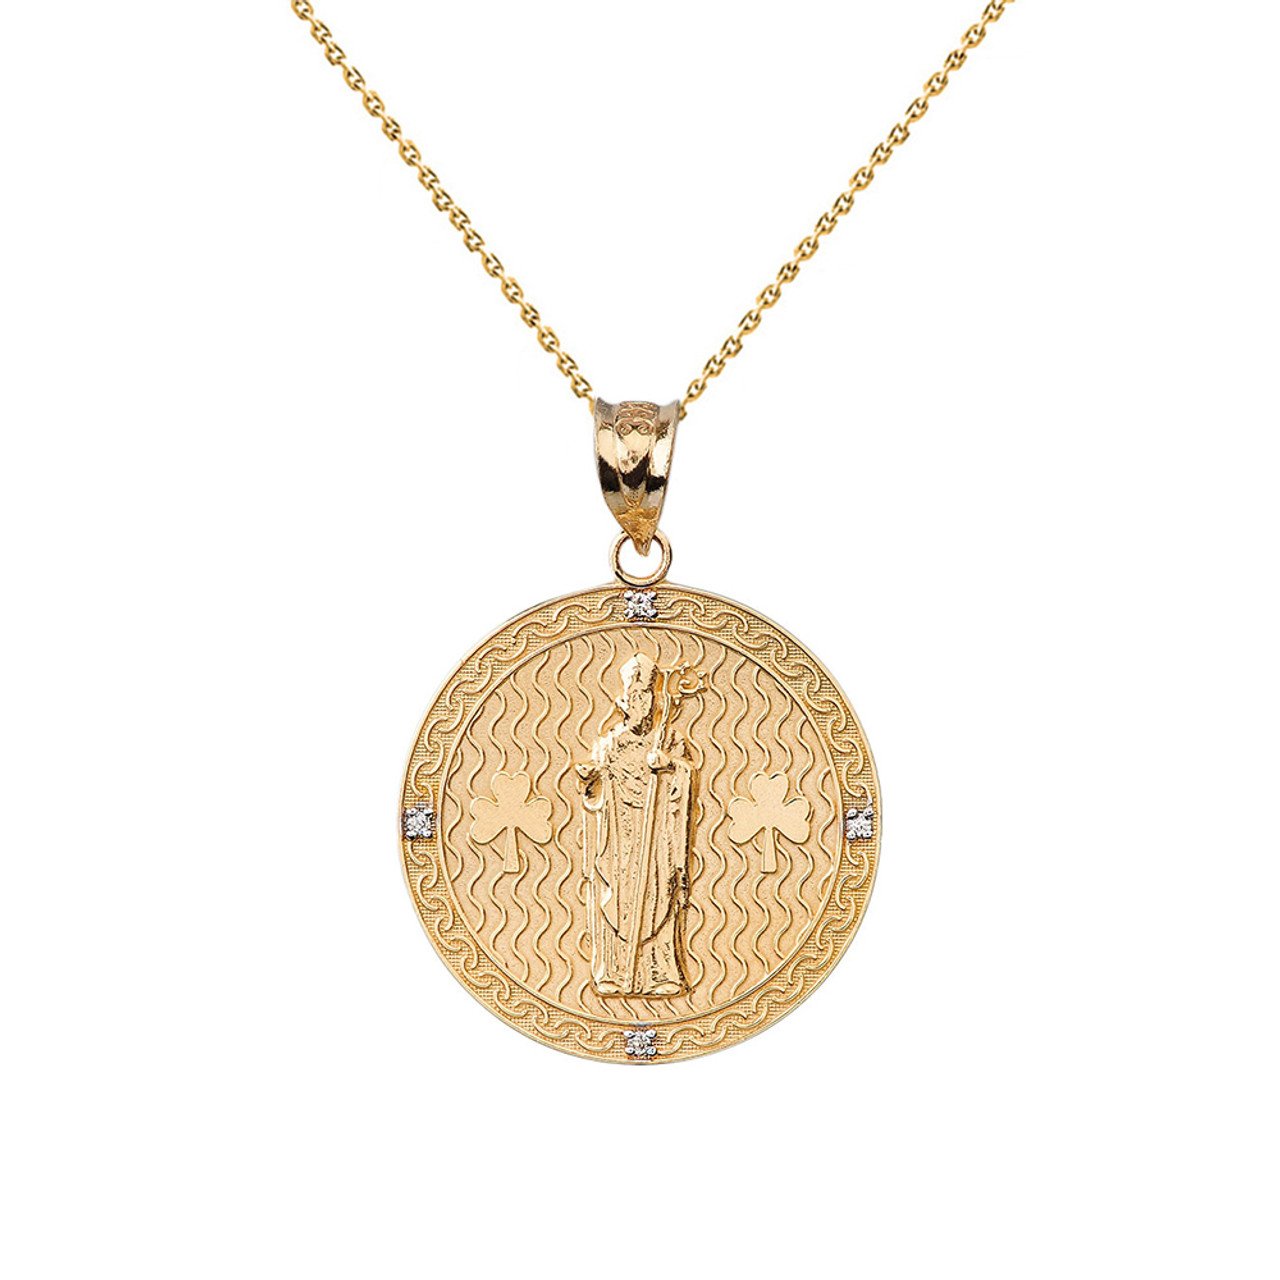 Solid yellow gold saint patrick shamrock diamond medallion pendant solid yellow gold saint patrick shamrock diamond medallion pendant necklace 105 26 mm aloadofball Choice Image